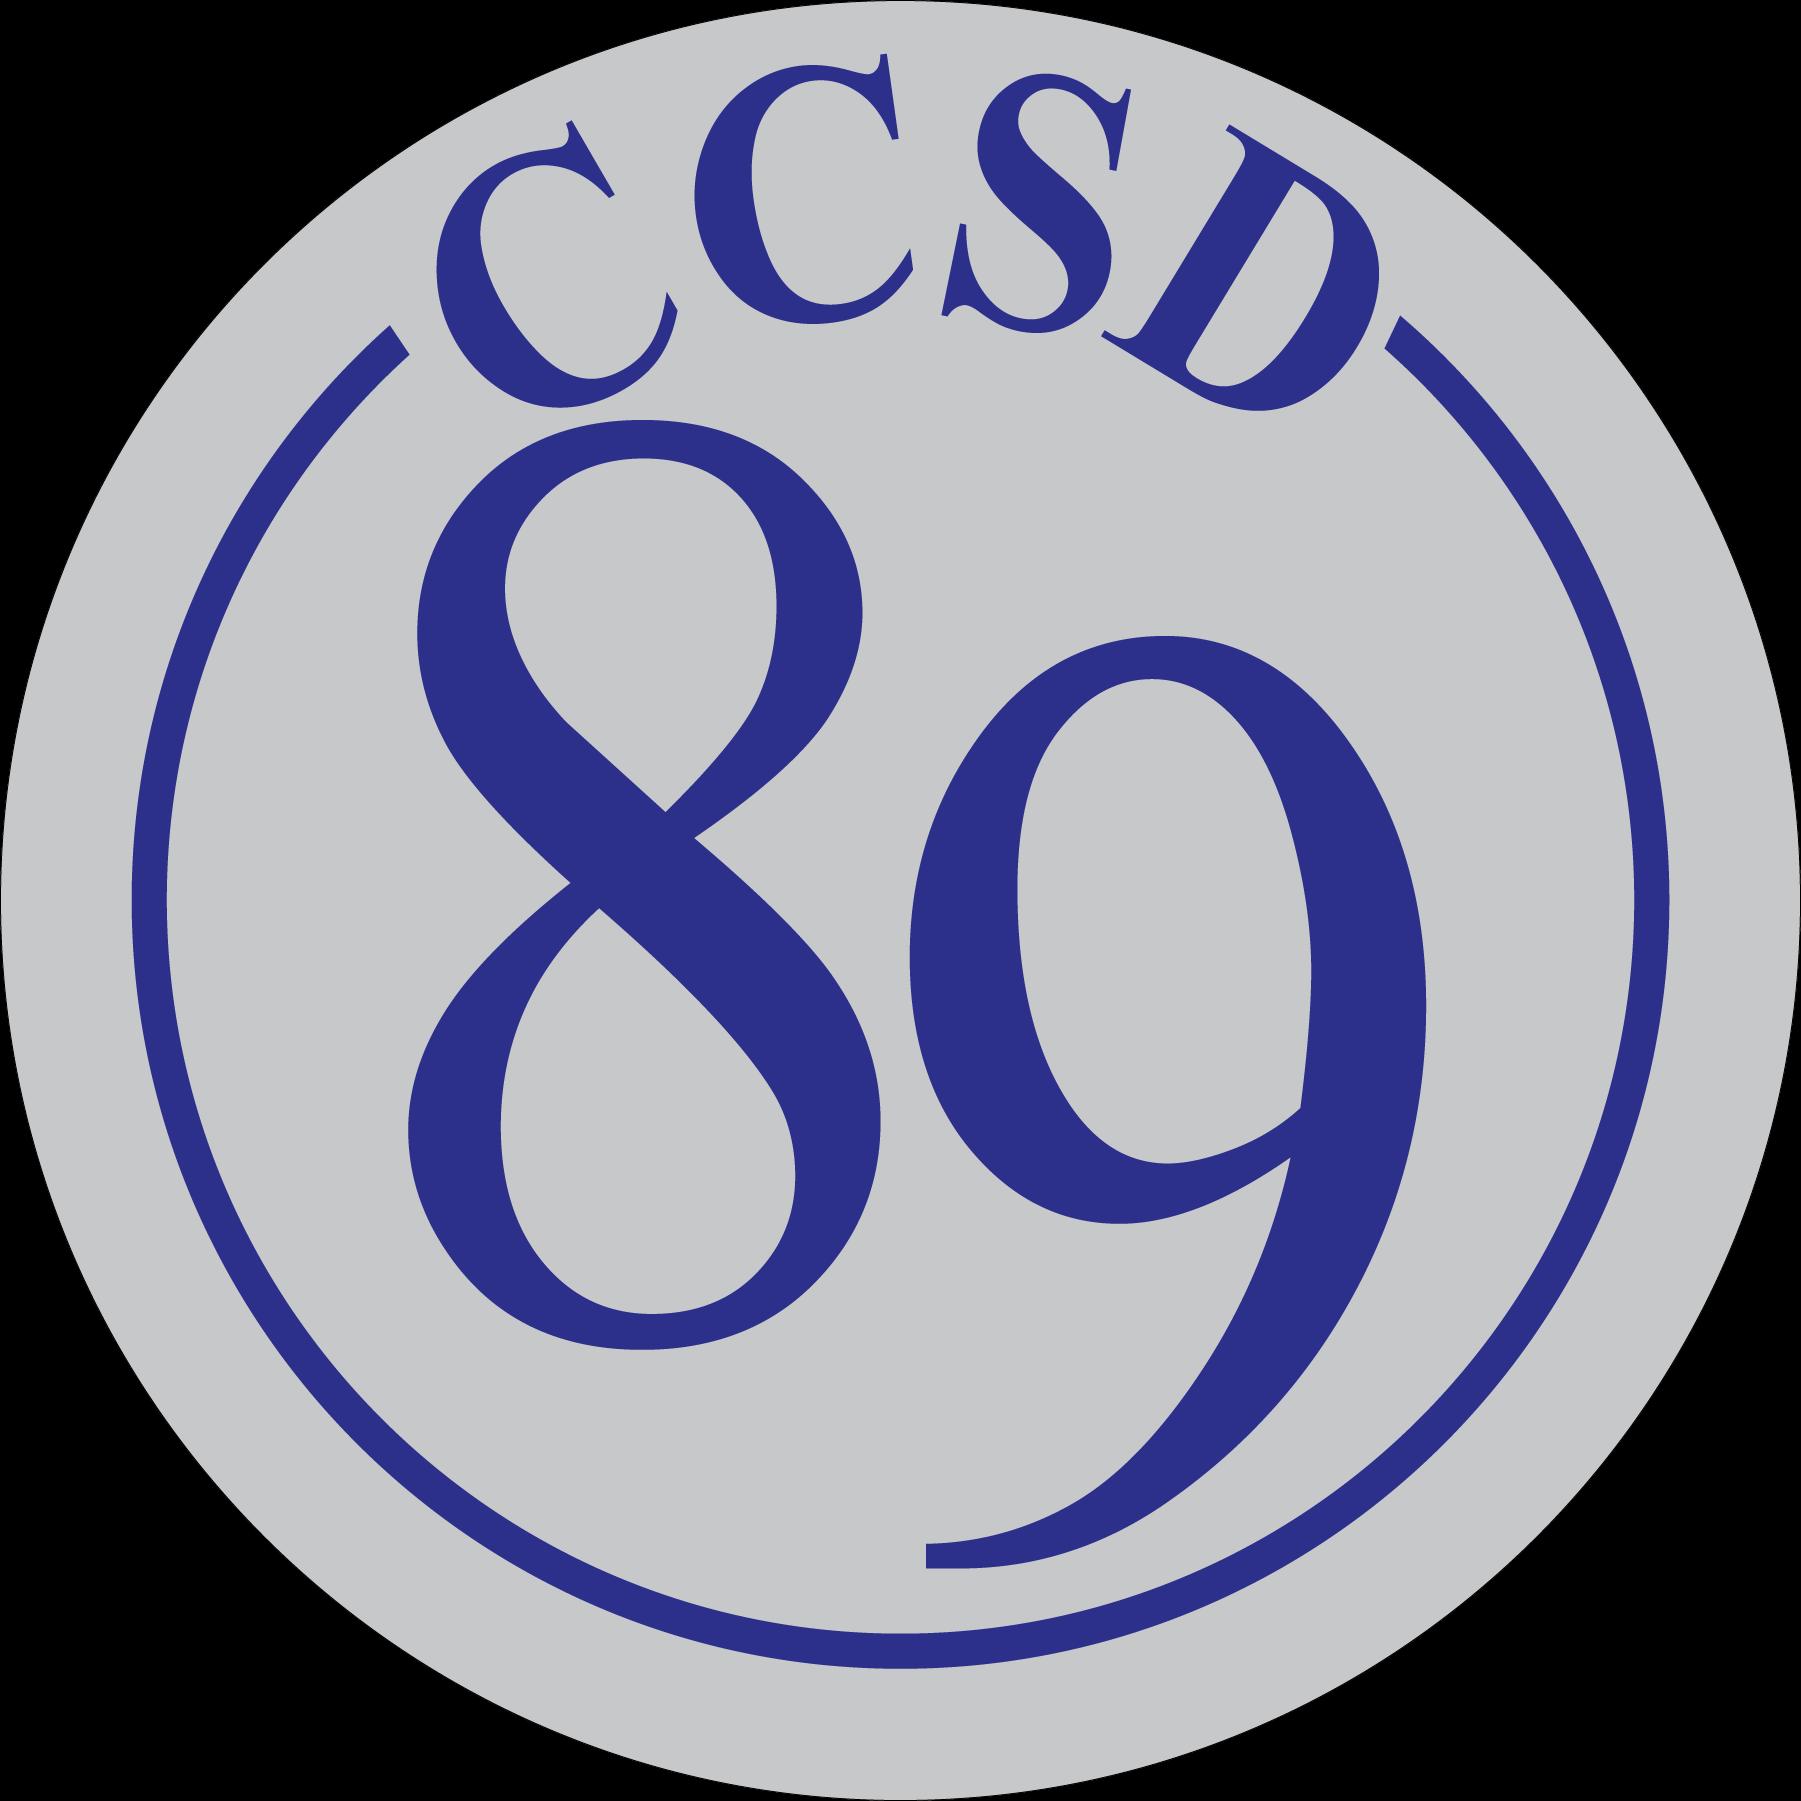 CCSD 89 logo 2021